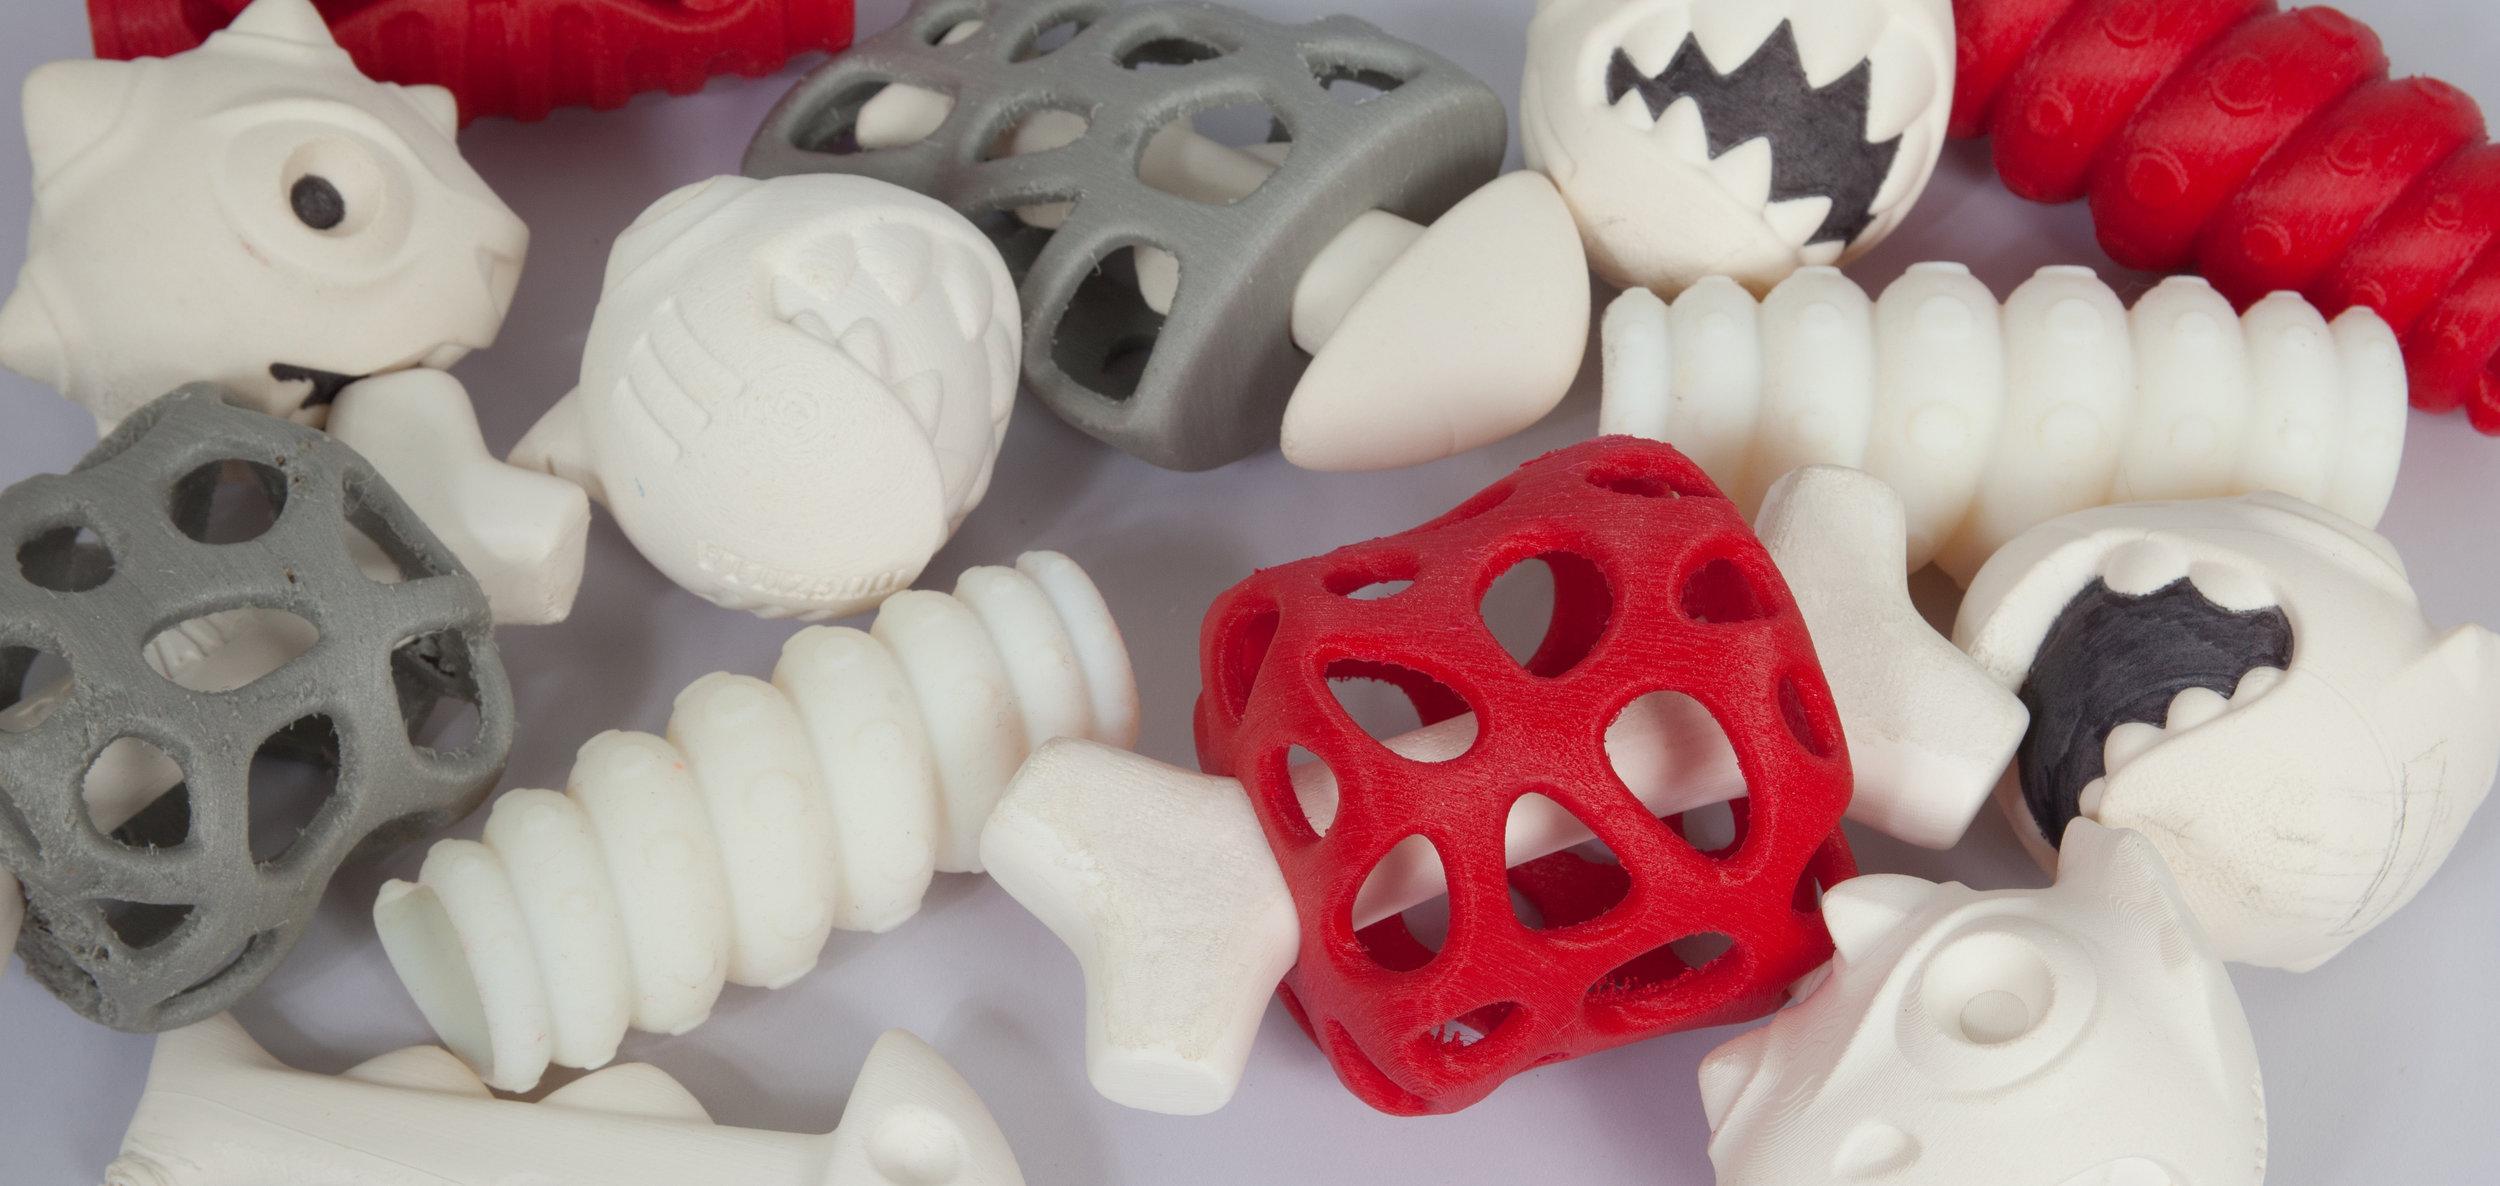 dogzilla-dog-toys-prototypes-nicholas-baker